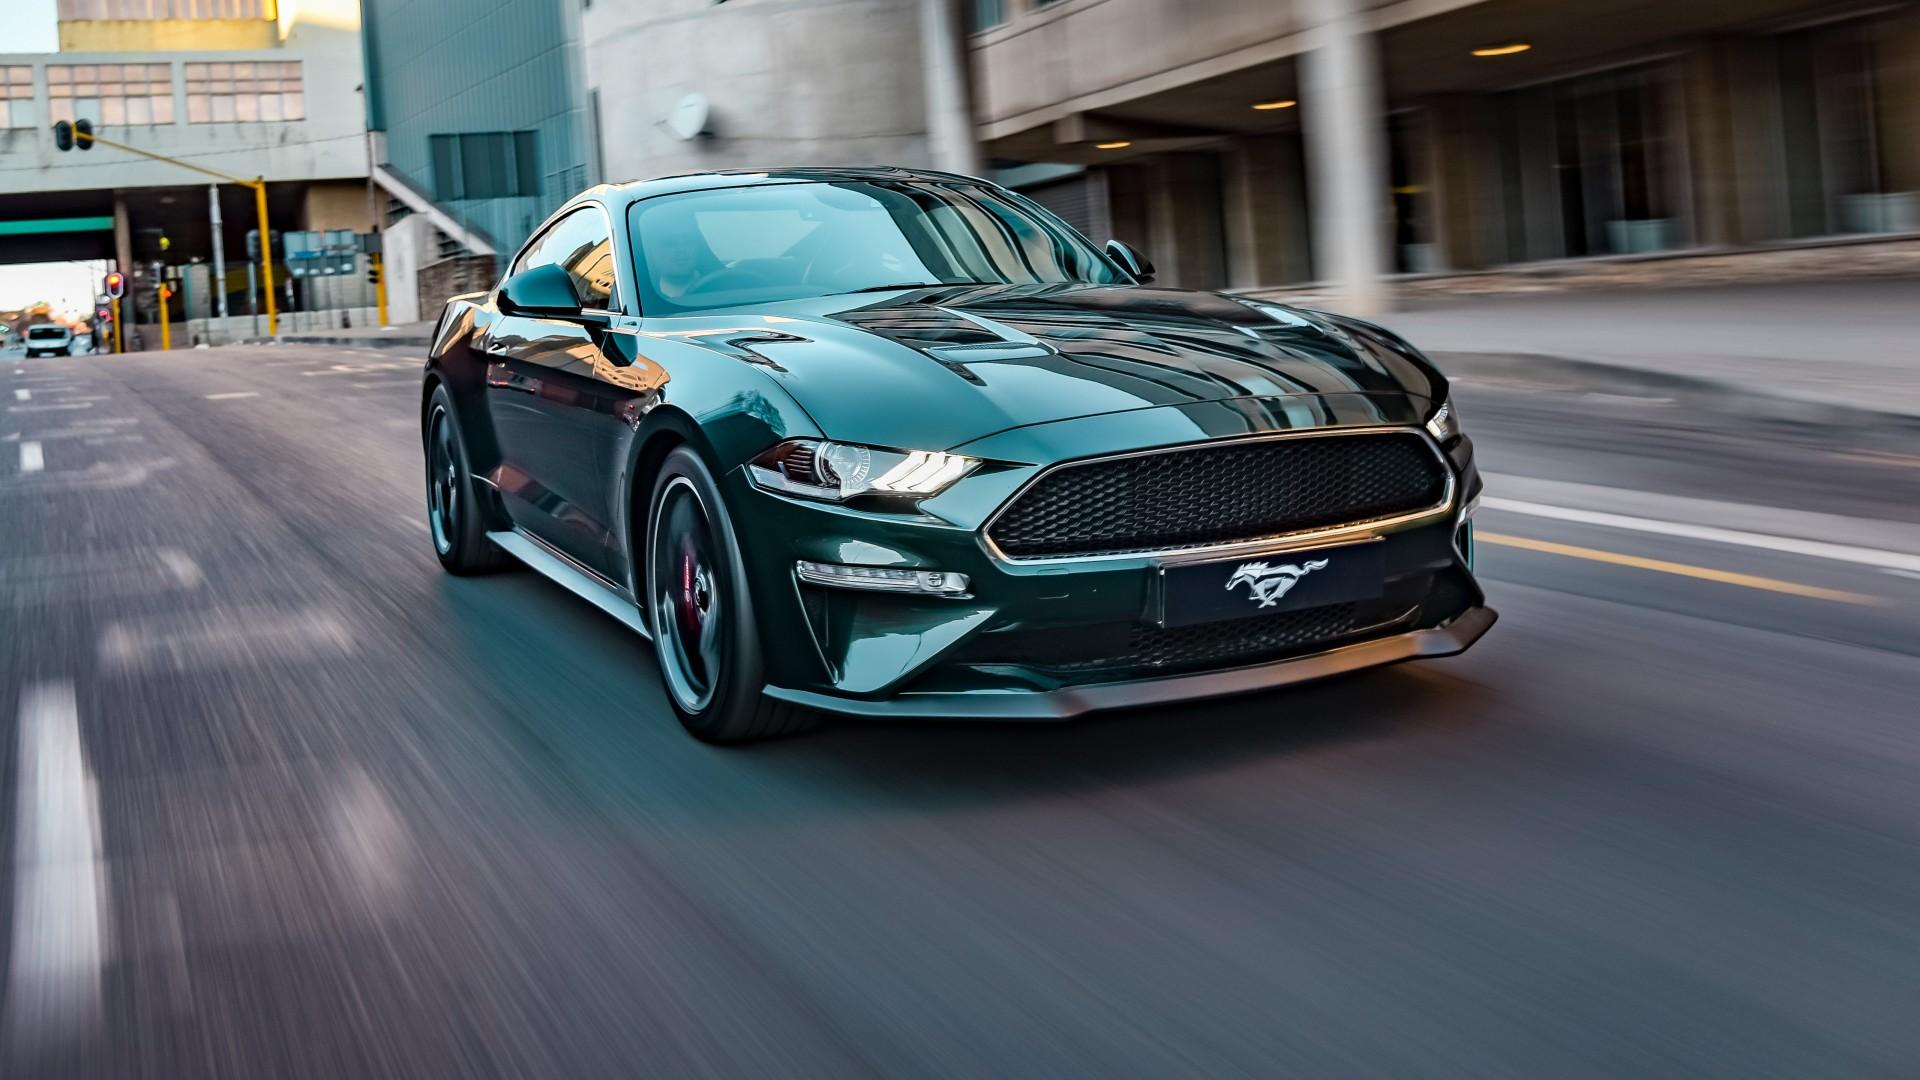 Ford Mustang Bullitt 2019 4K 7 Wallpaper | HD Car ...